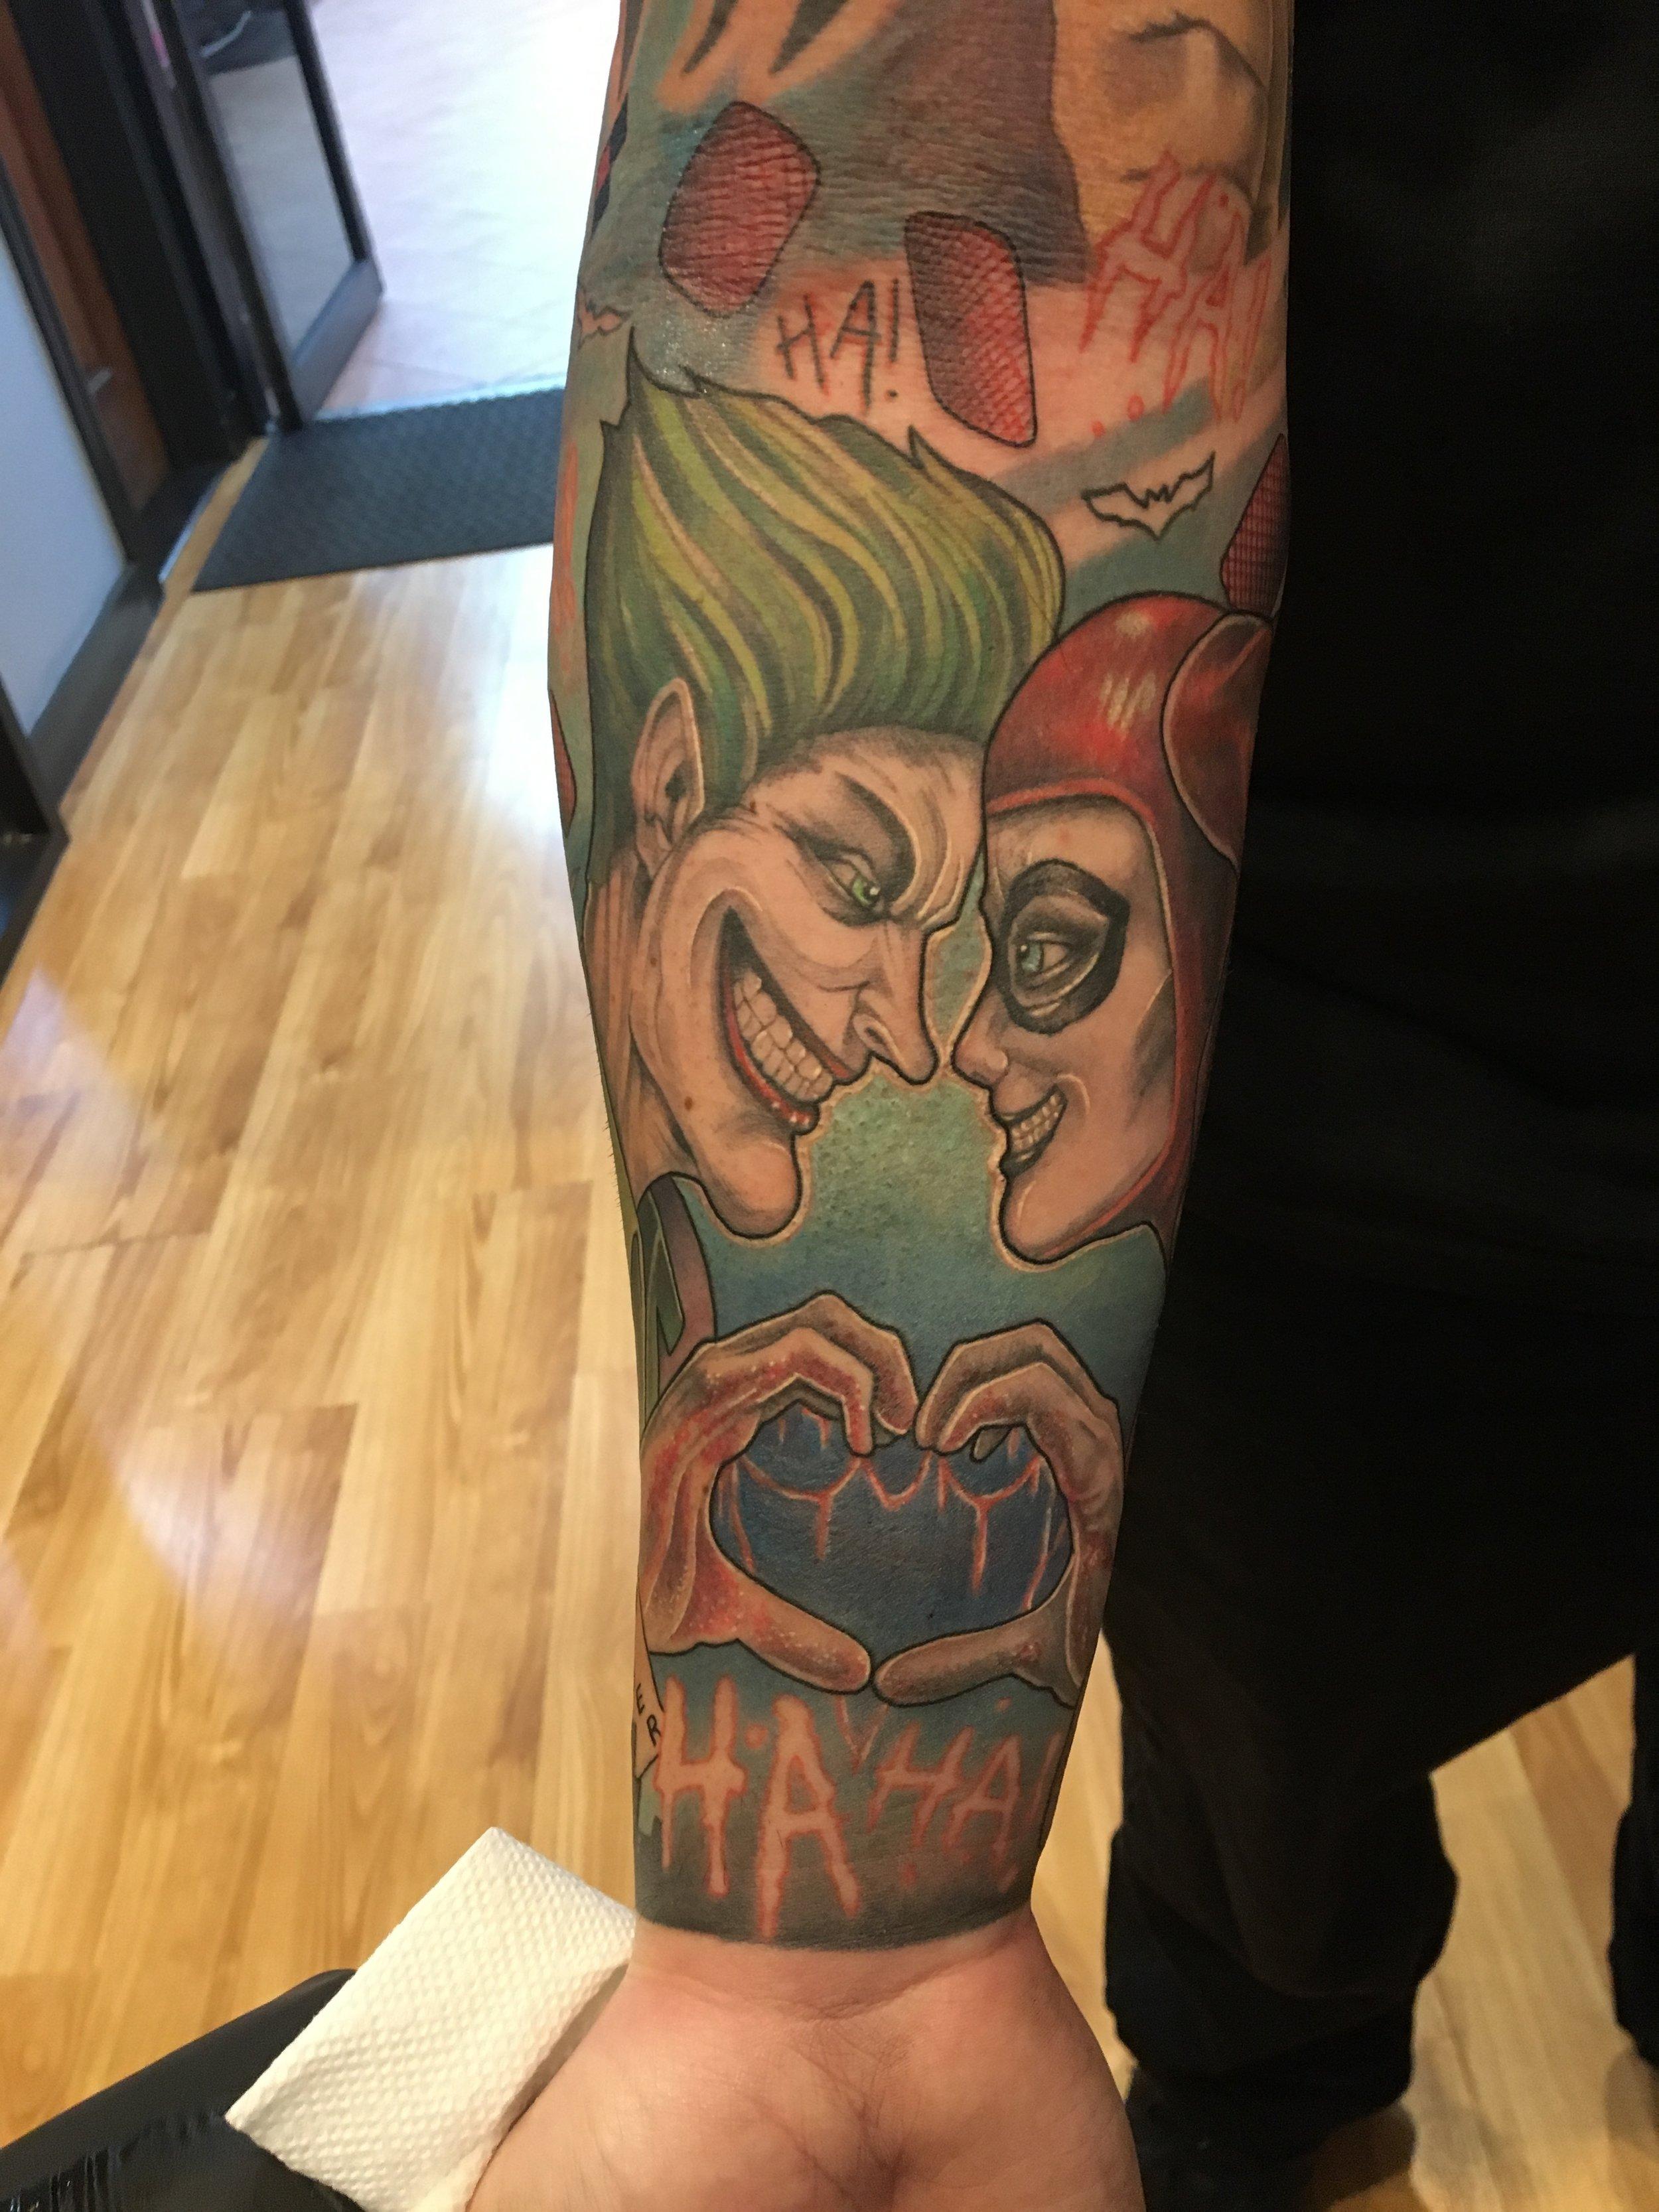 tattoo-joker-harley-quinn.JPG